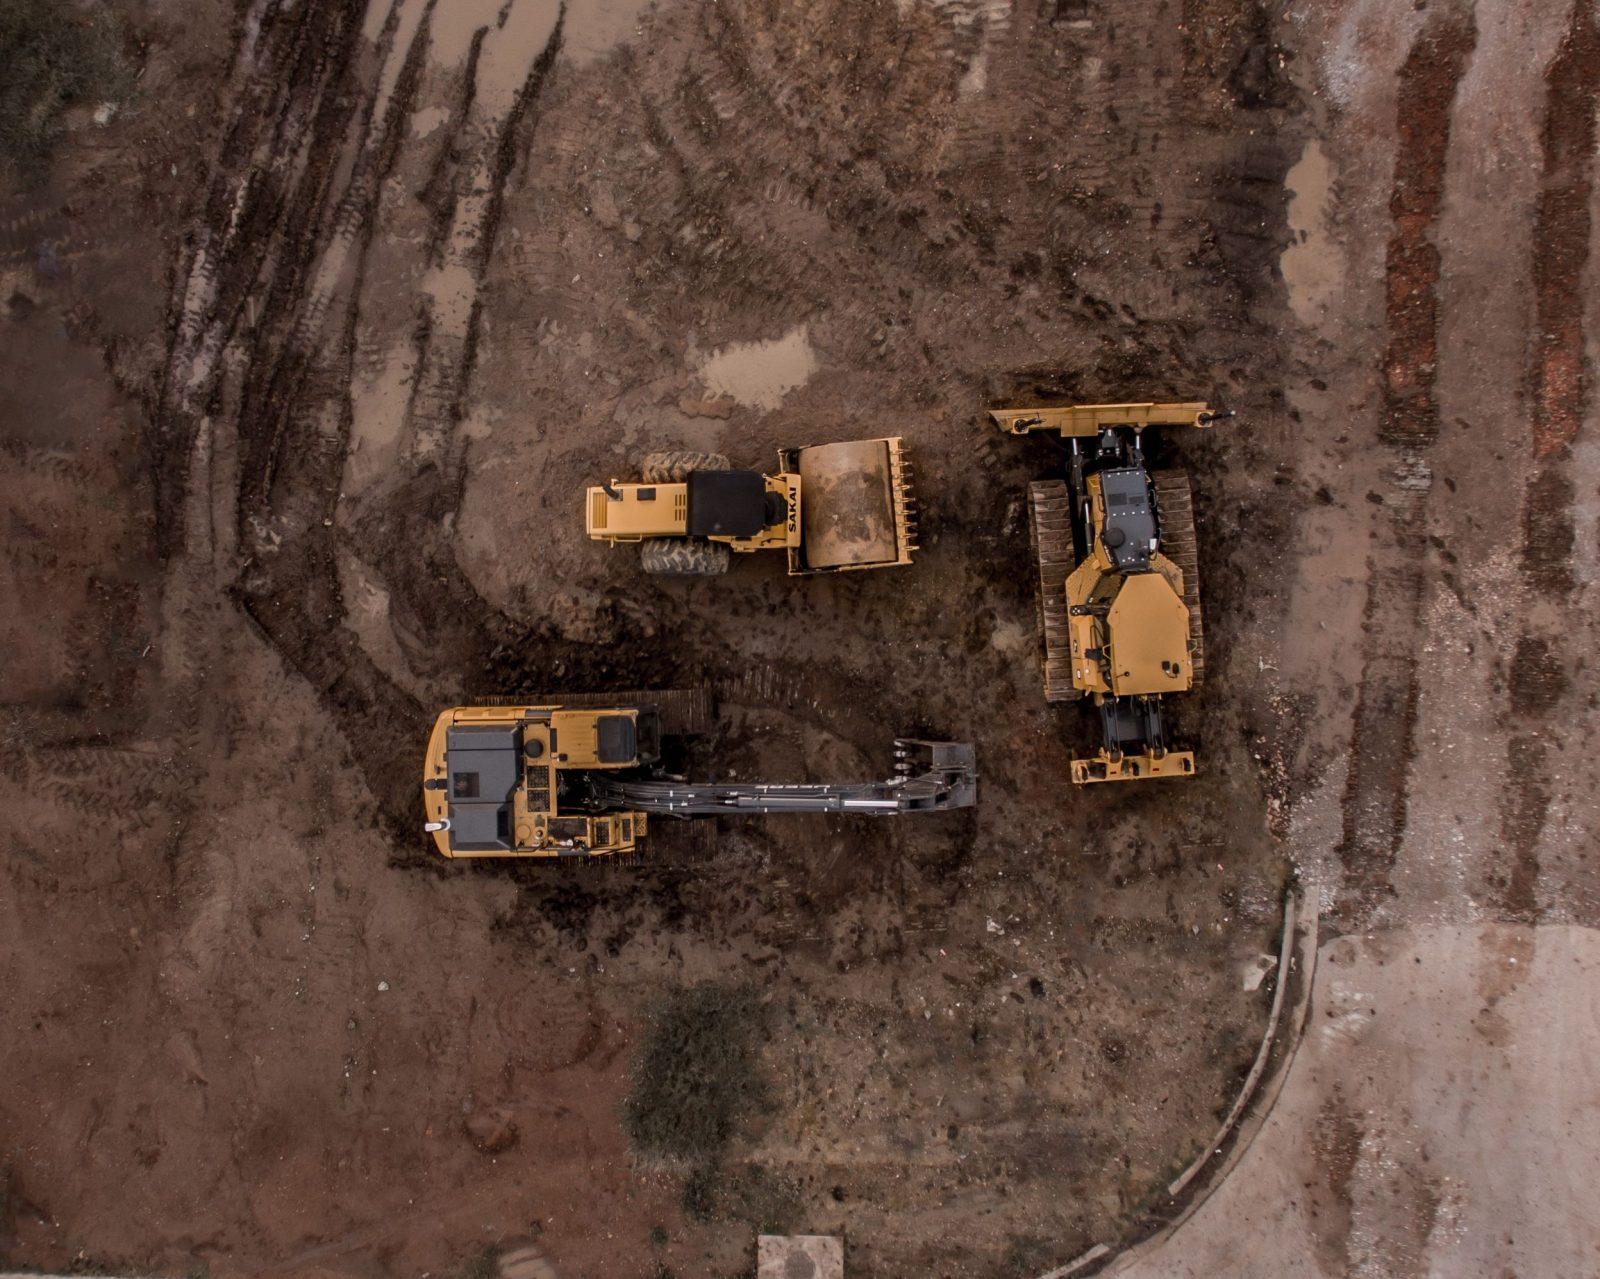 aerial-photo-of-excavator-road-roller-and-bulldozer-157935226